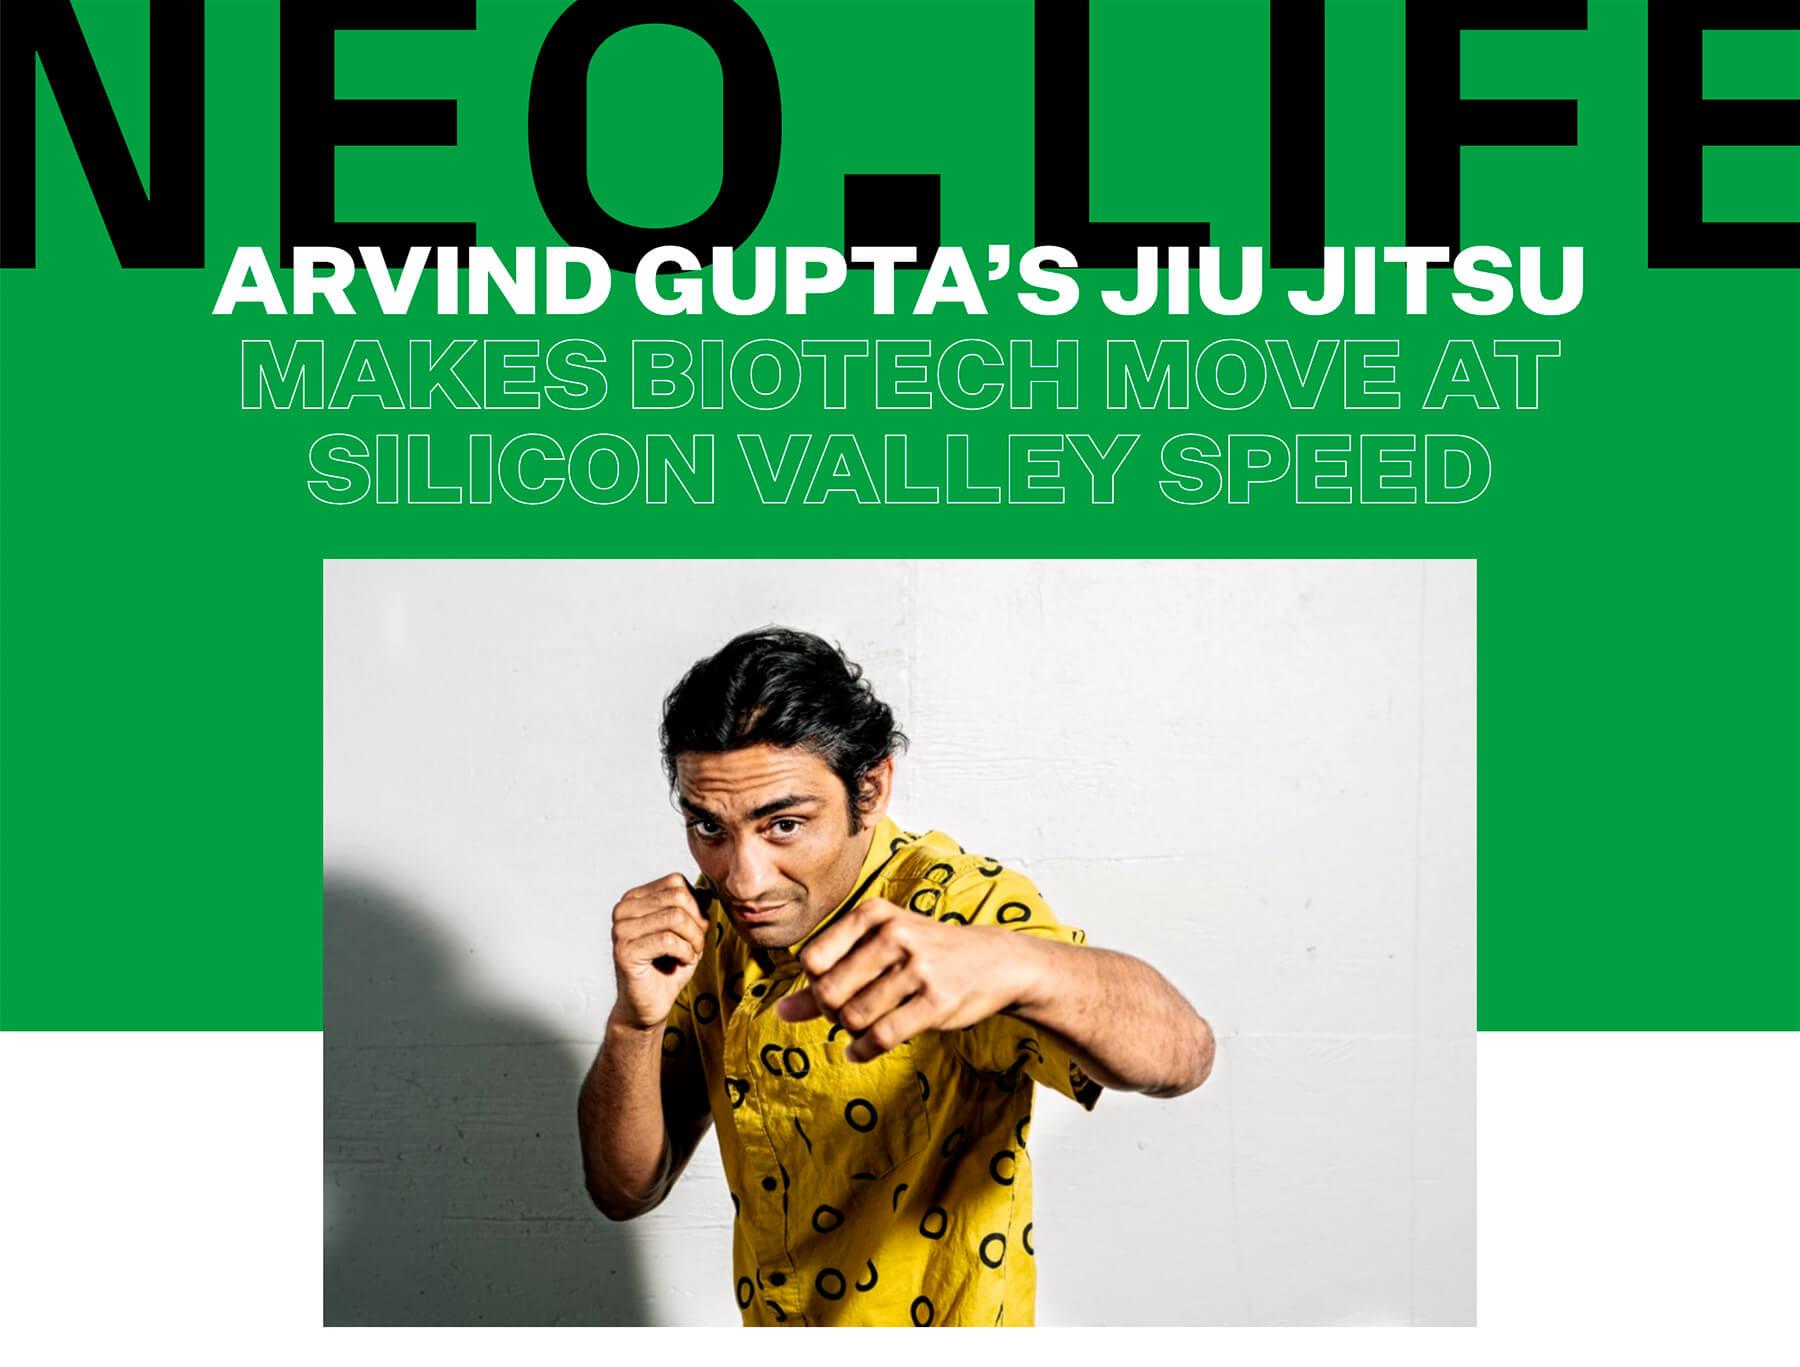 Arvind Gupta shadowboxing